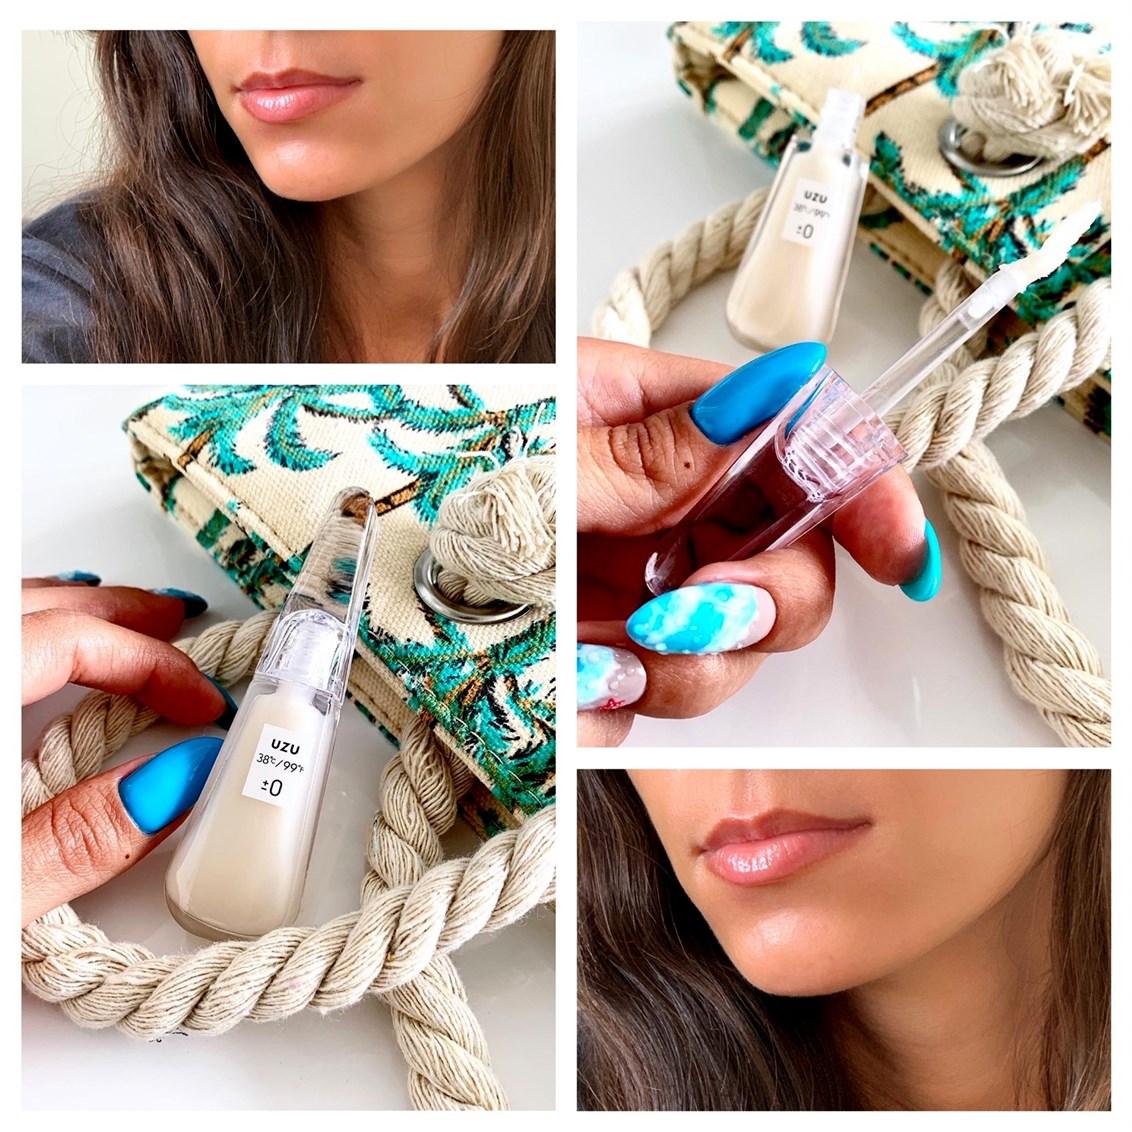 UZU Flowfushi 38˚C/99˚F Lip Treatment swatch